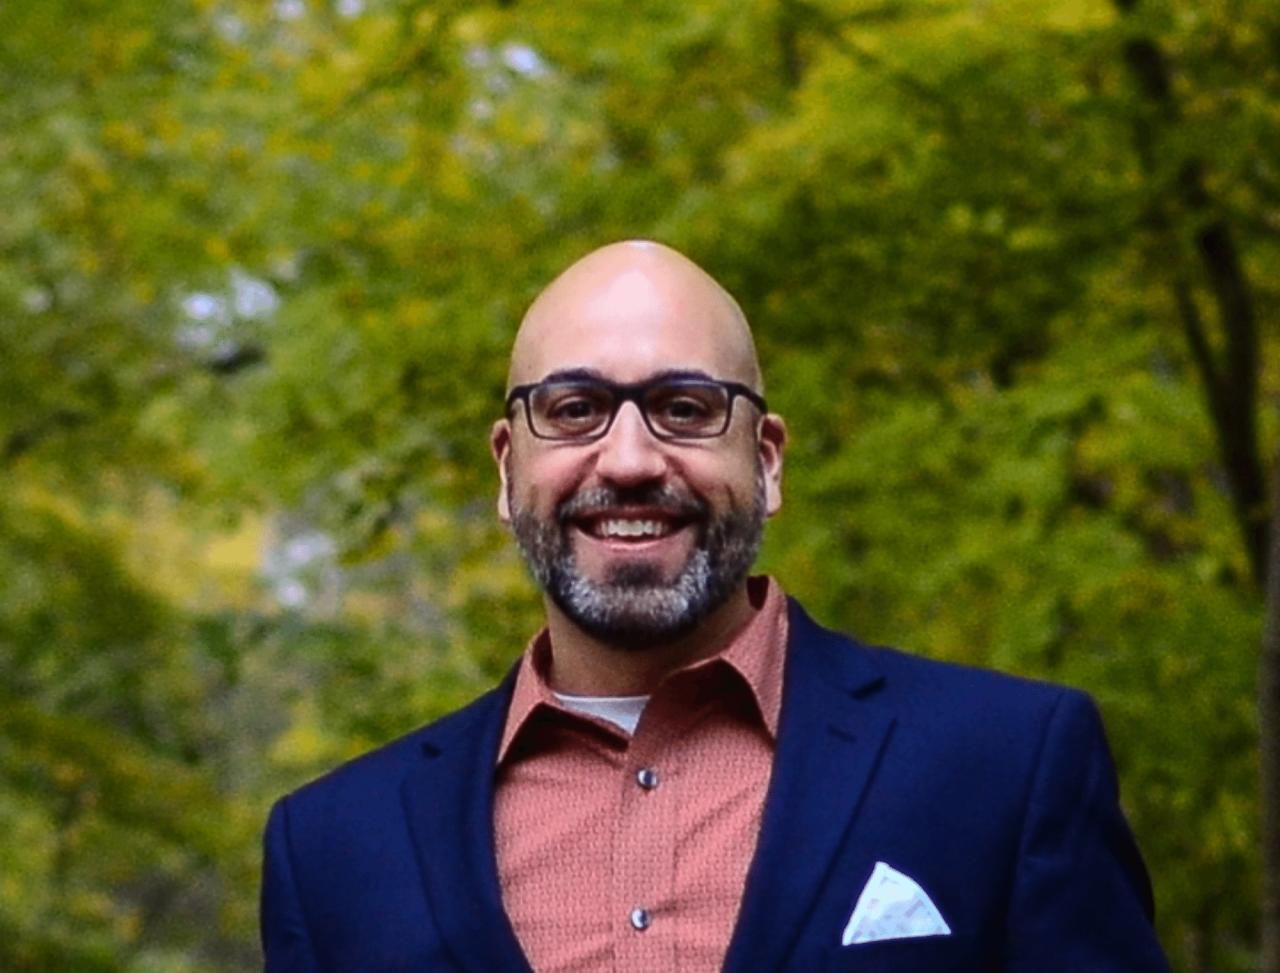 https://entrepreneurmindz.com/wp-content/uploads/2021/10/Conversation-With-Dan-Herron-1280x973.png